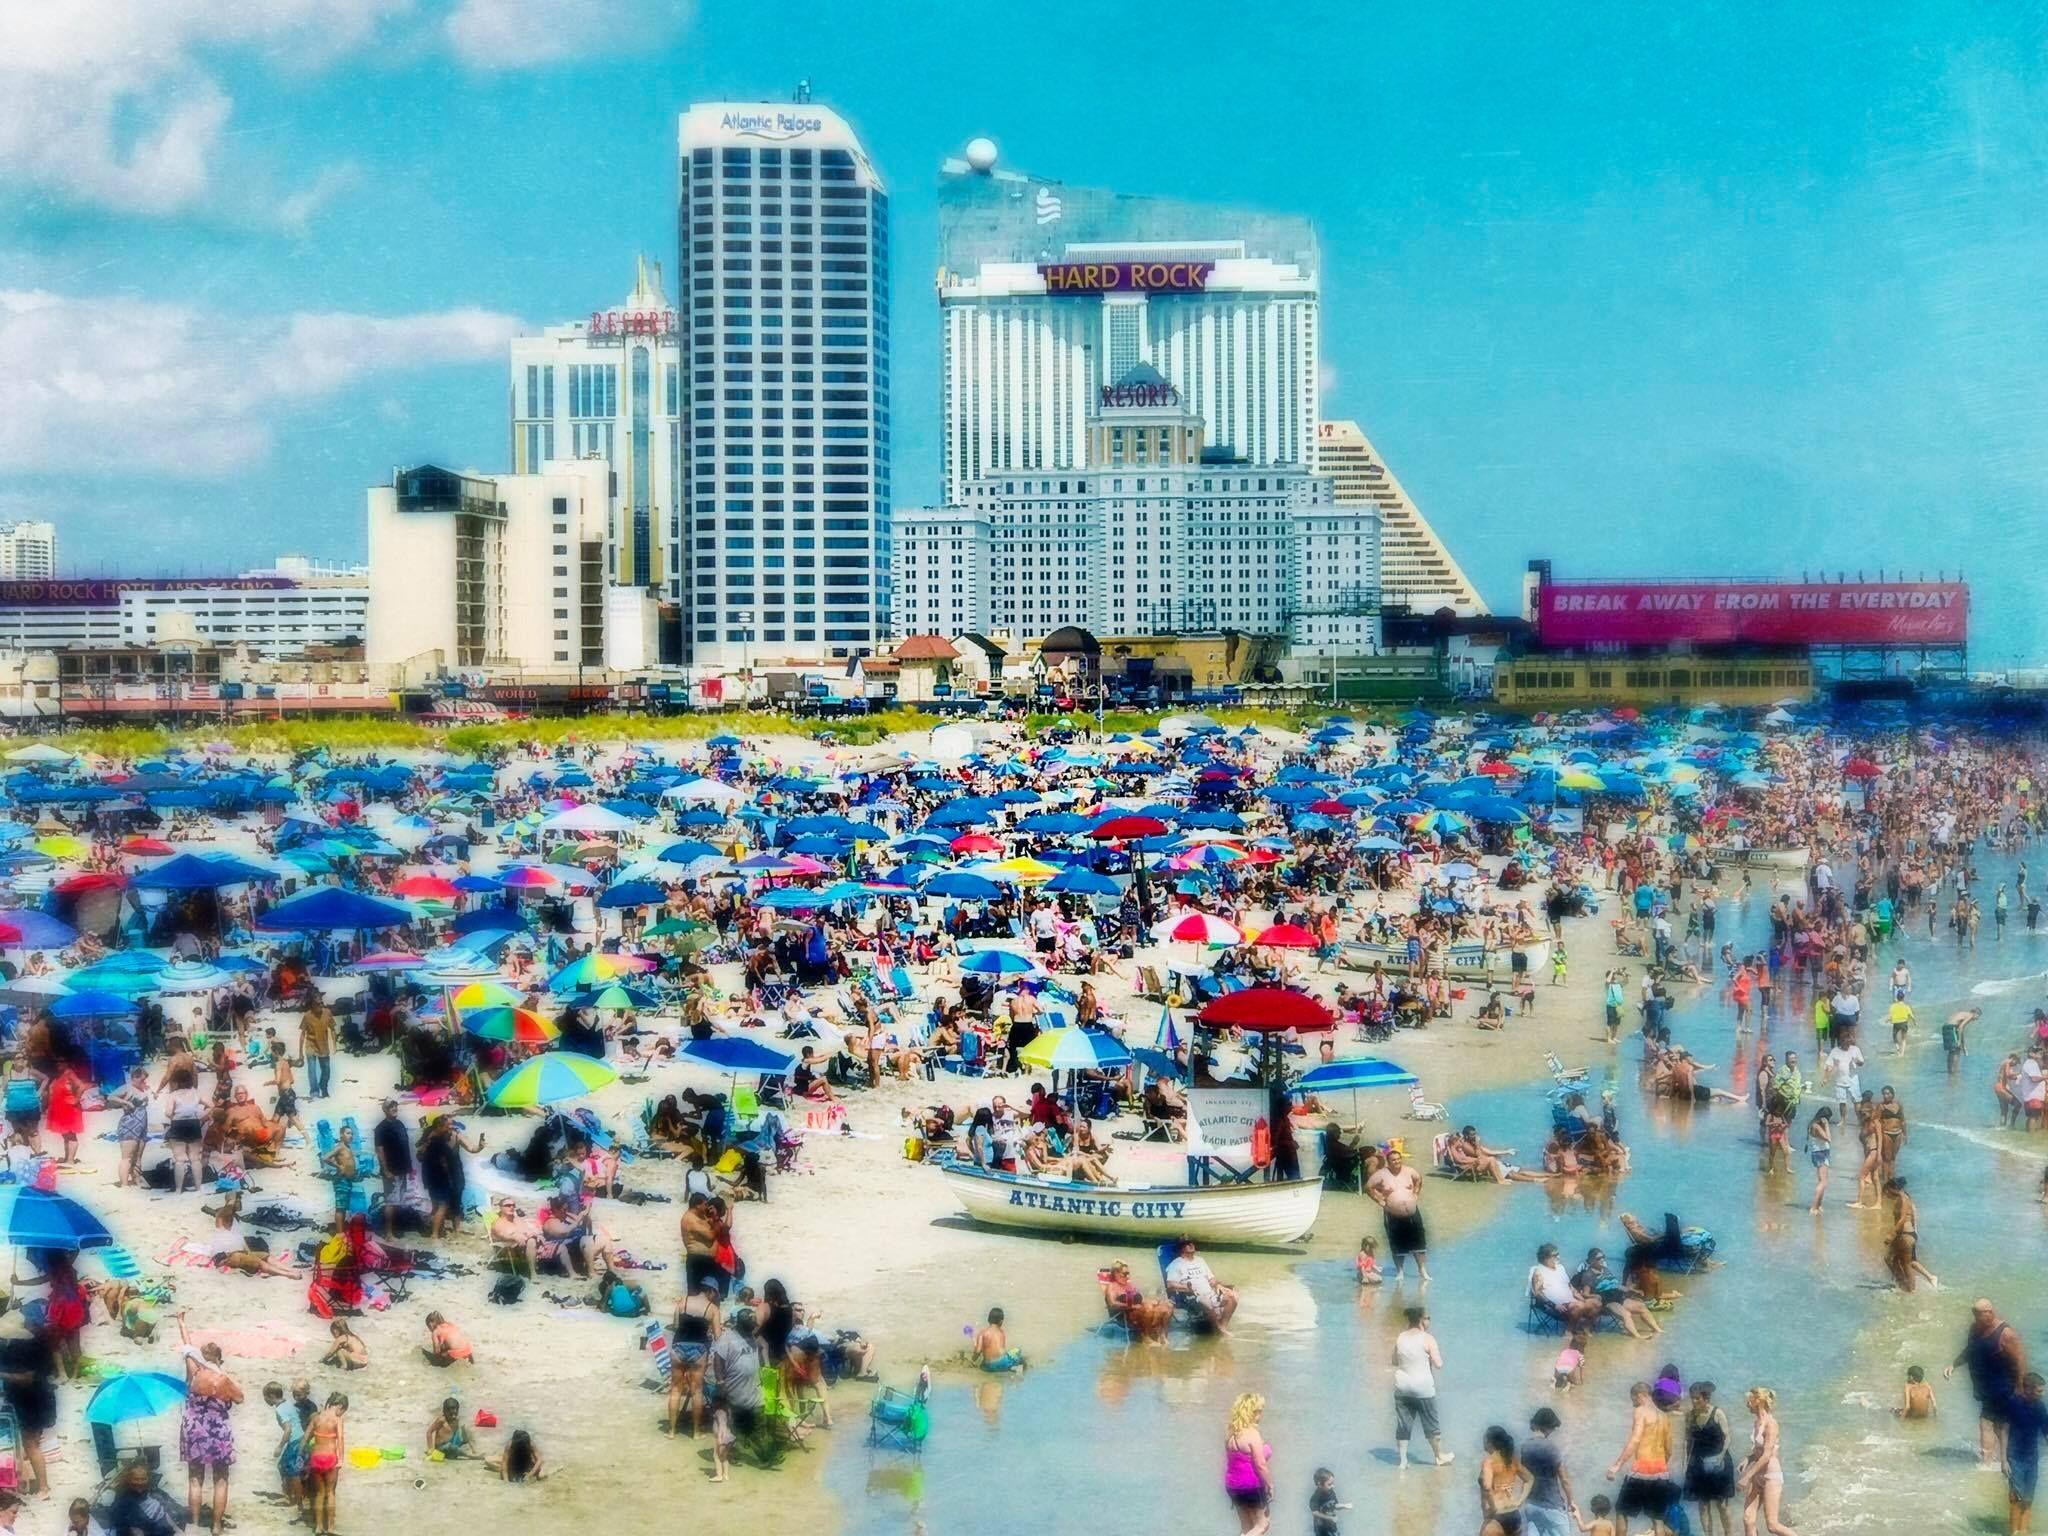 Atlantic City Casinos Report 15 3 Percent Profit Decline In Q3 Market Saturation Blamed Atlantic City Casino Atlantic City City